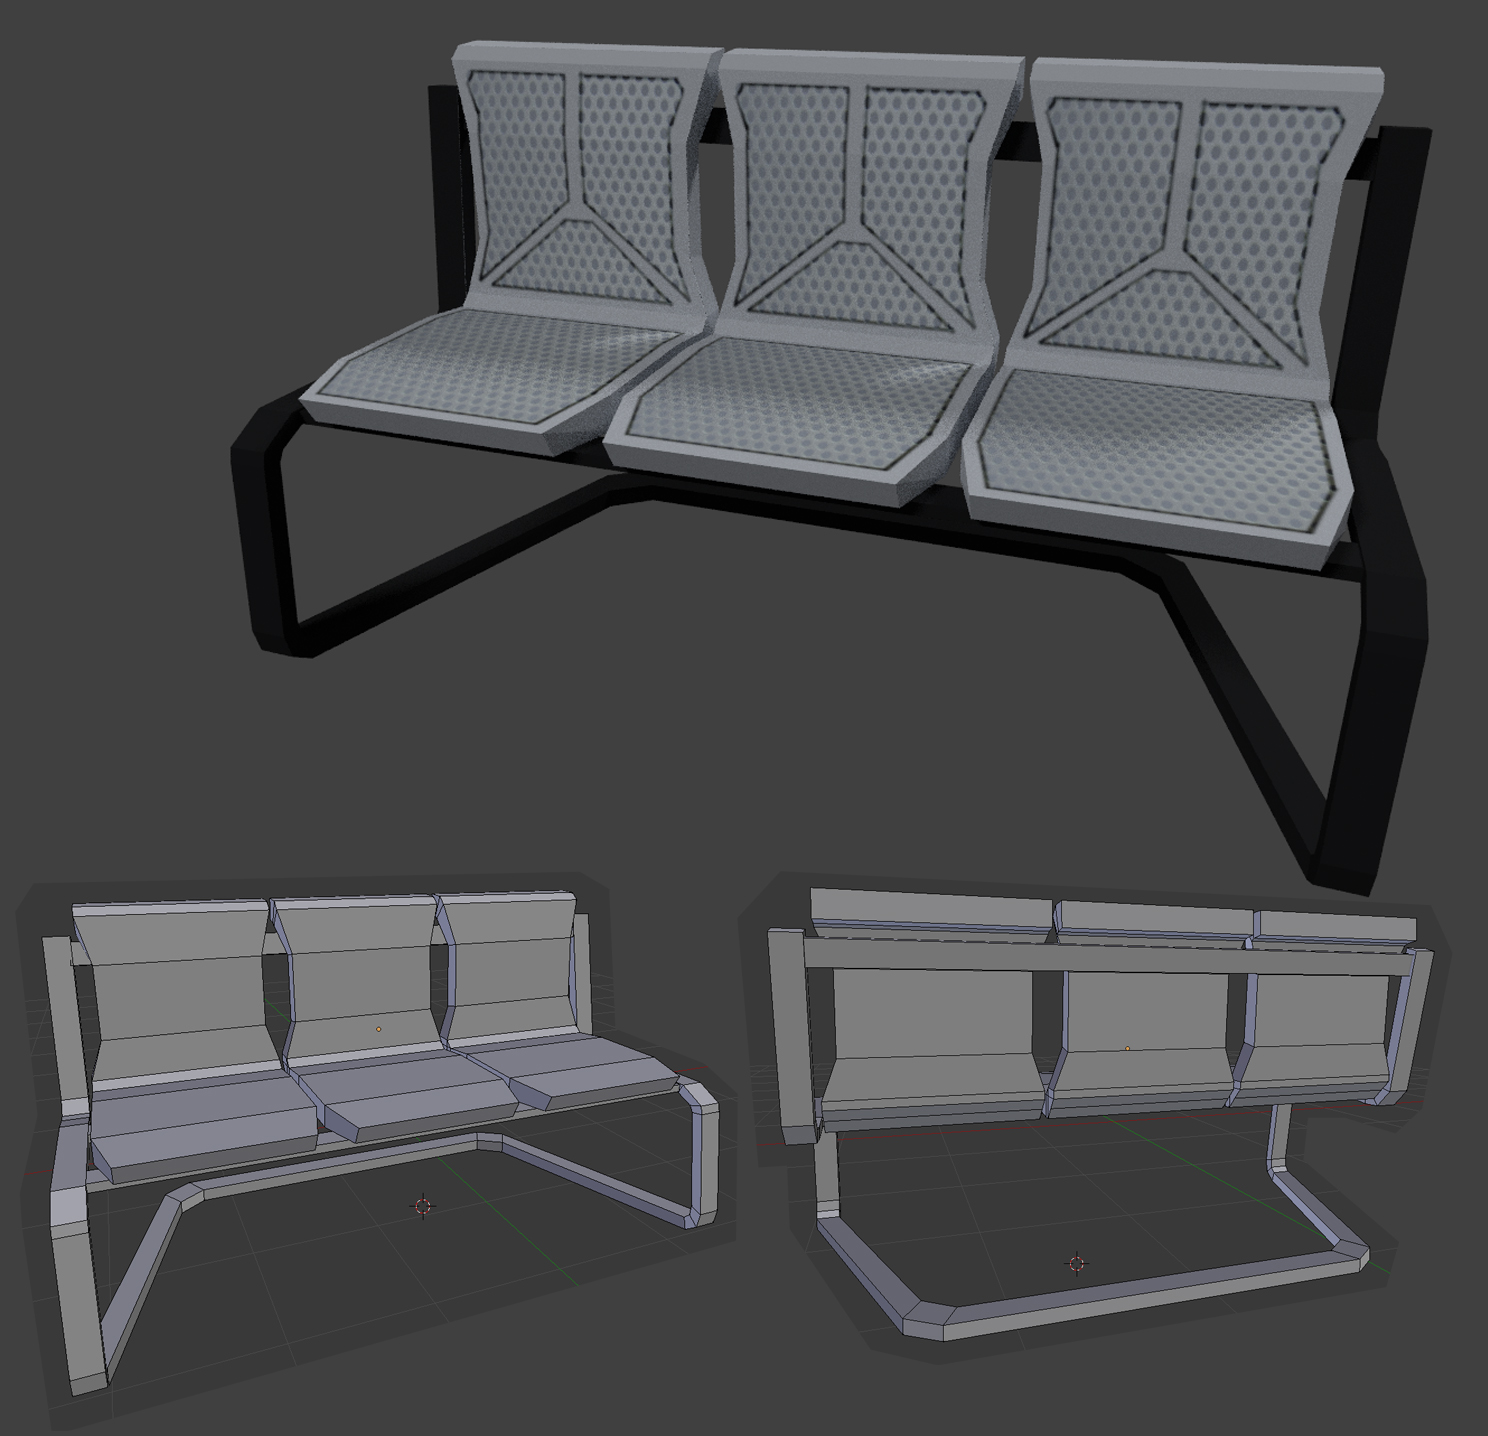 bench_render